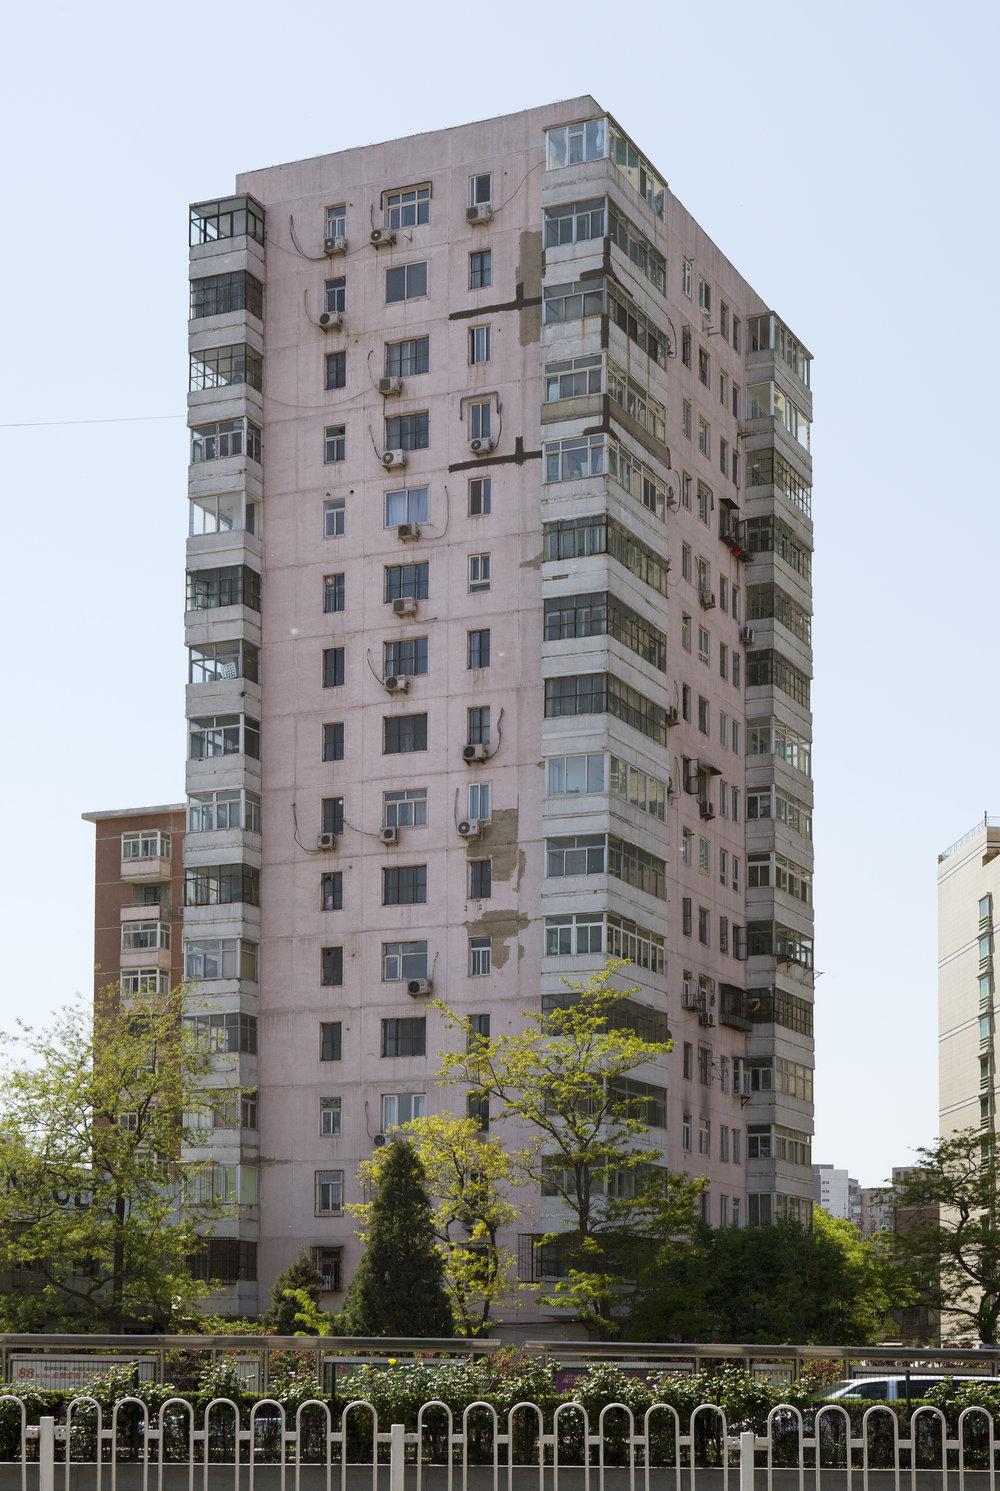 janot-building9-2011.jpg